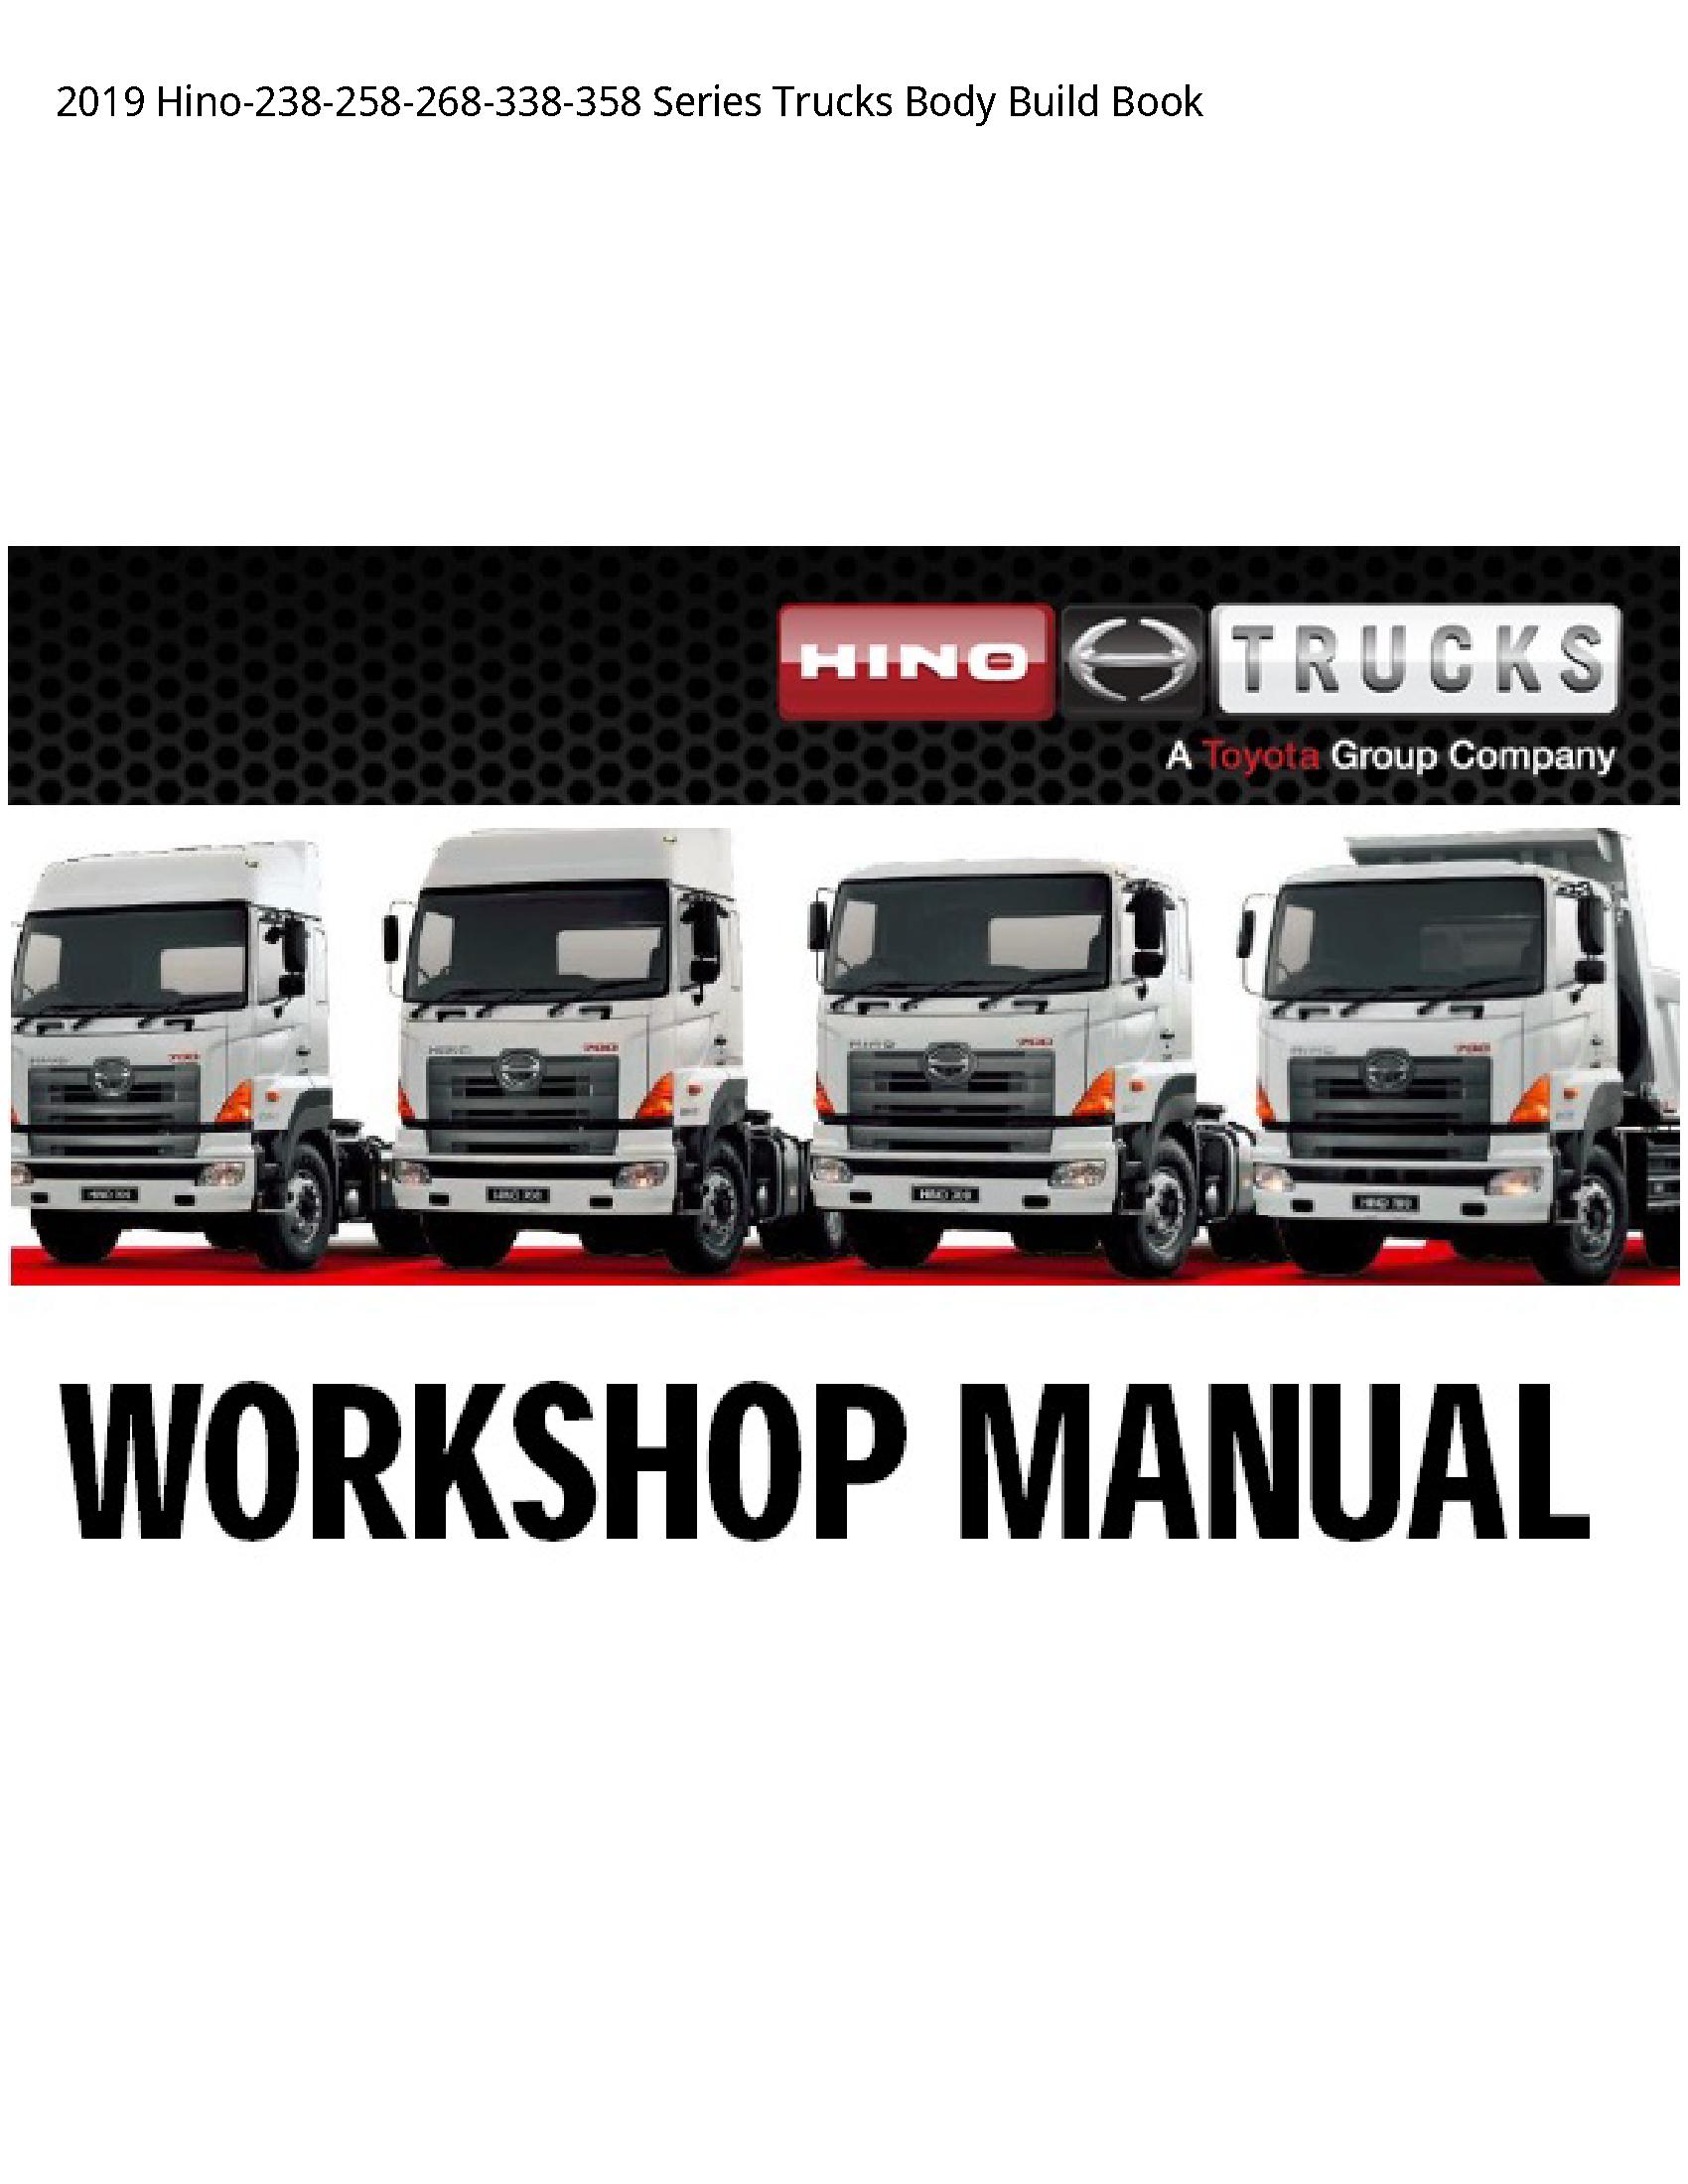 Hino -238-258-268-338-358 Series Trucks Body Build Book manual